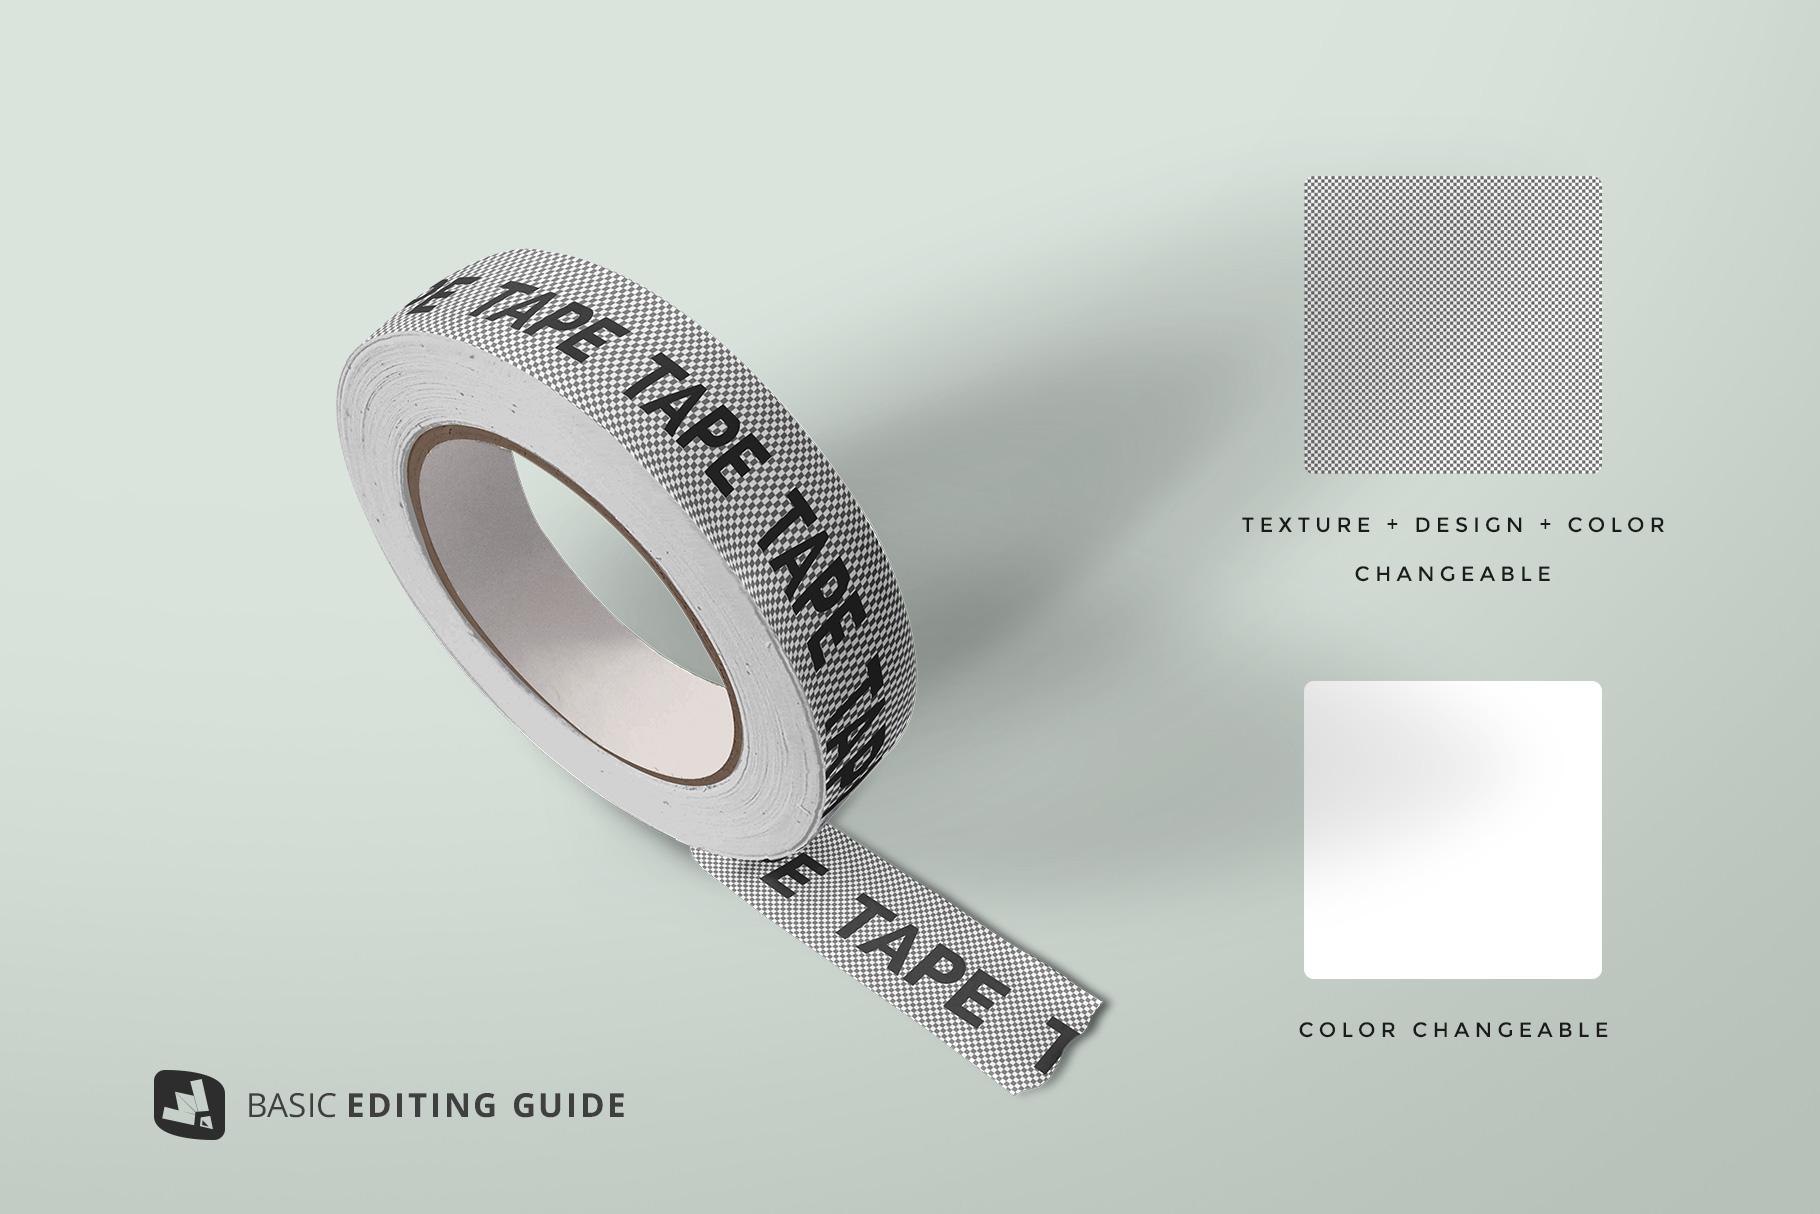 editability of the themed washi tape roll mockup